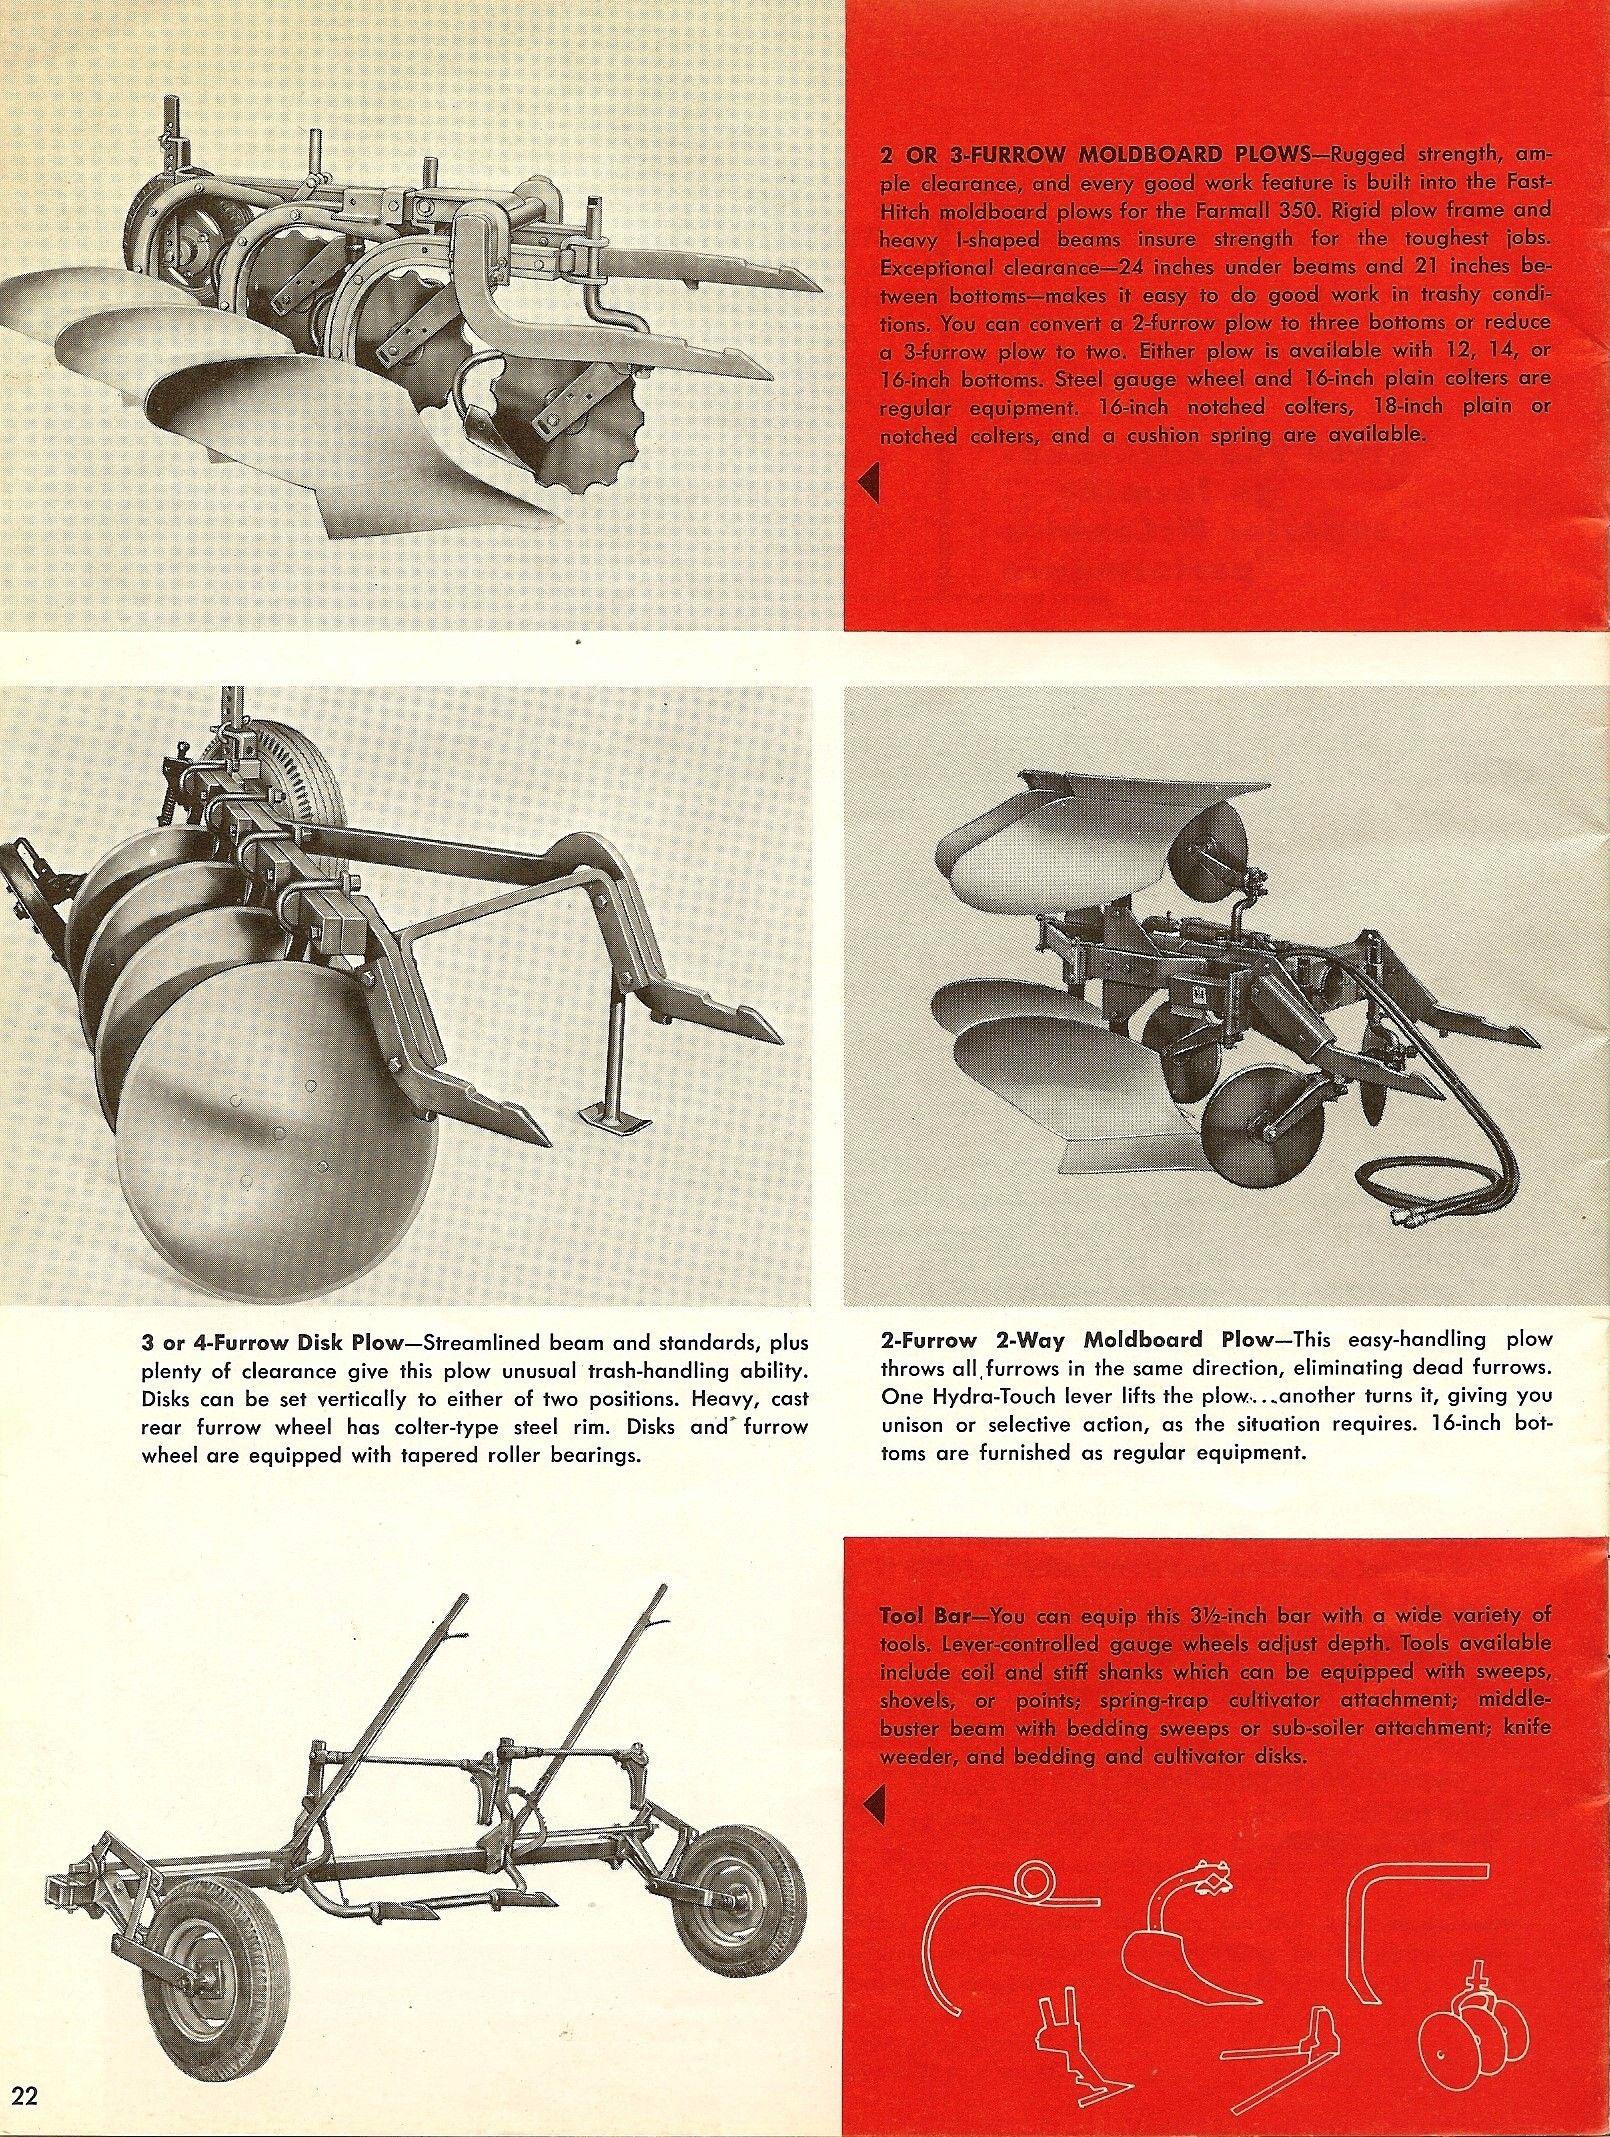 FARMALL 350 Brochure | farmall | Vintage tractors, Tractor